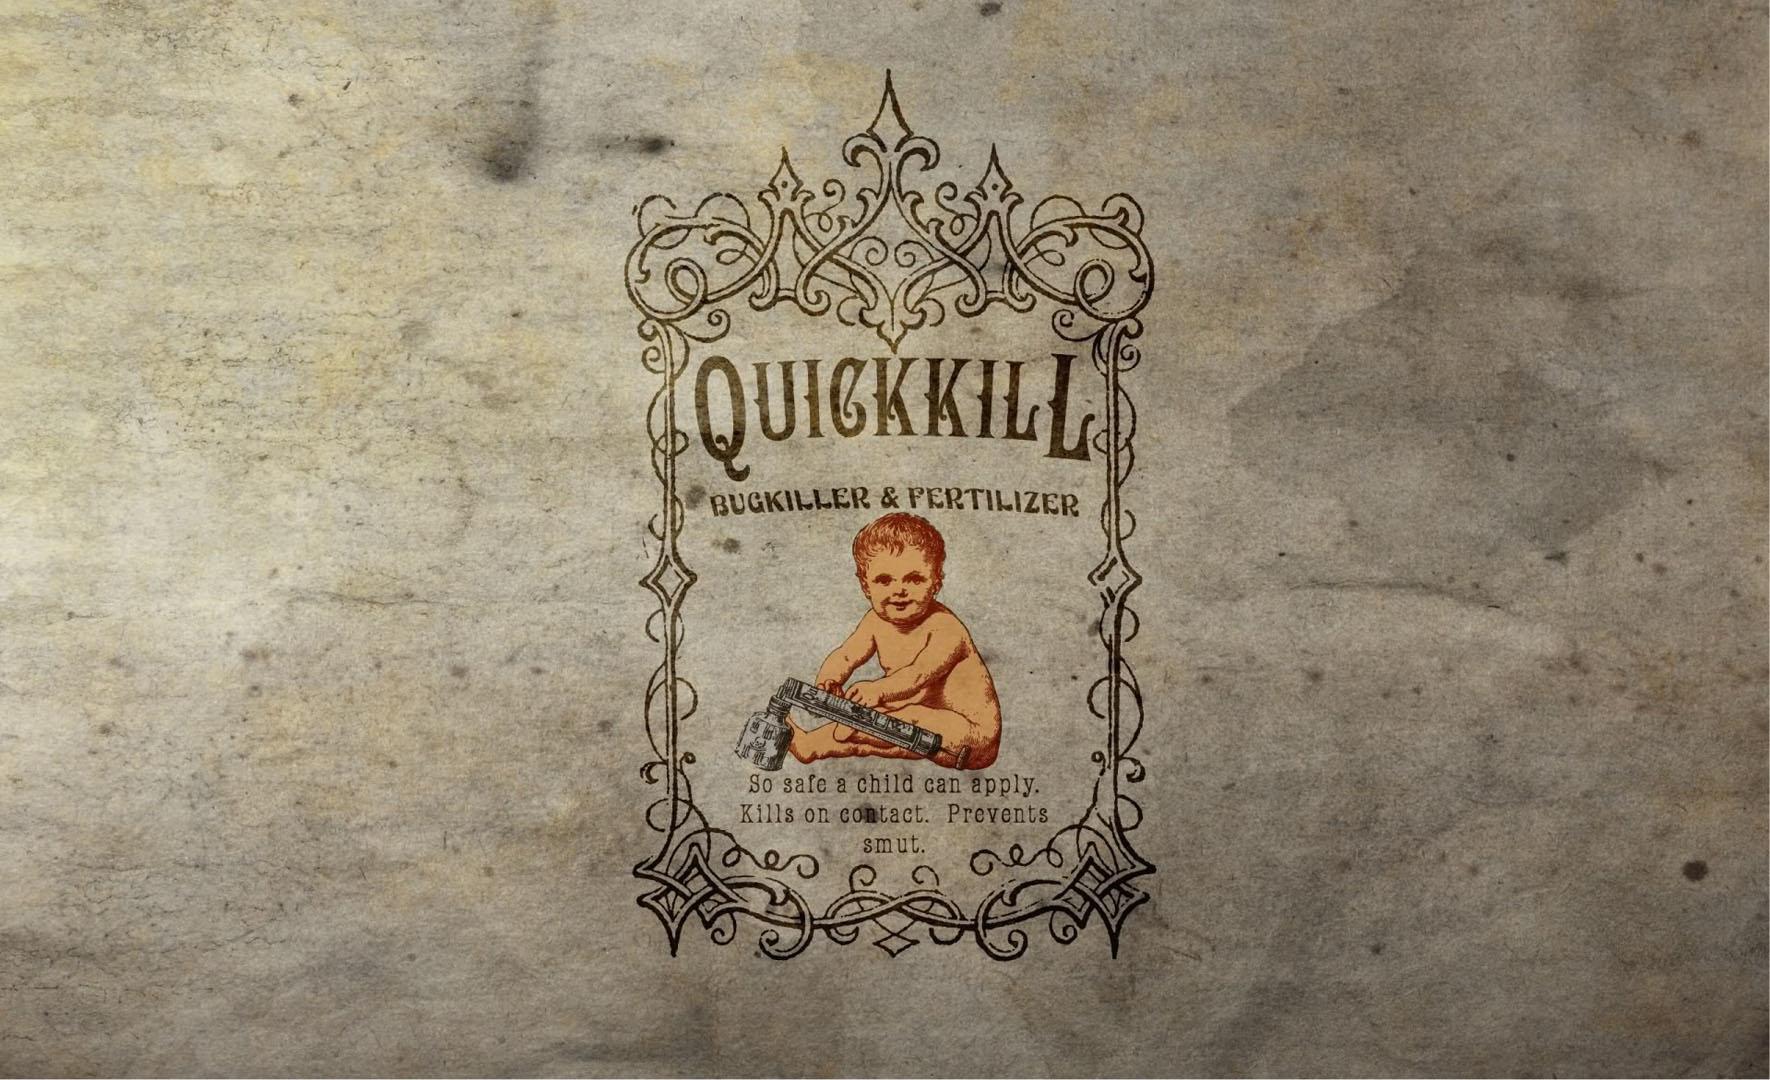 Quick Kill Bugkiller And Fertilizer Advert